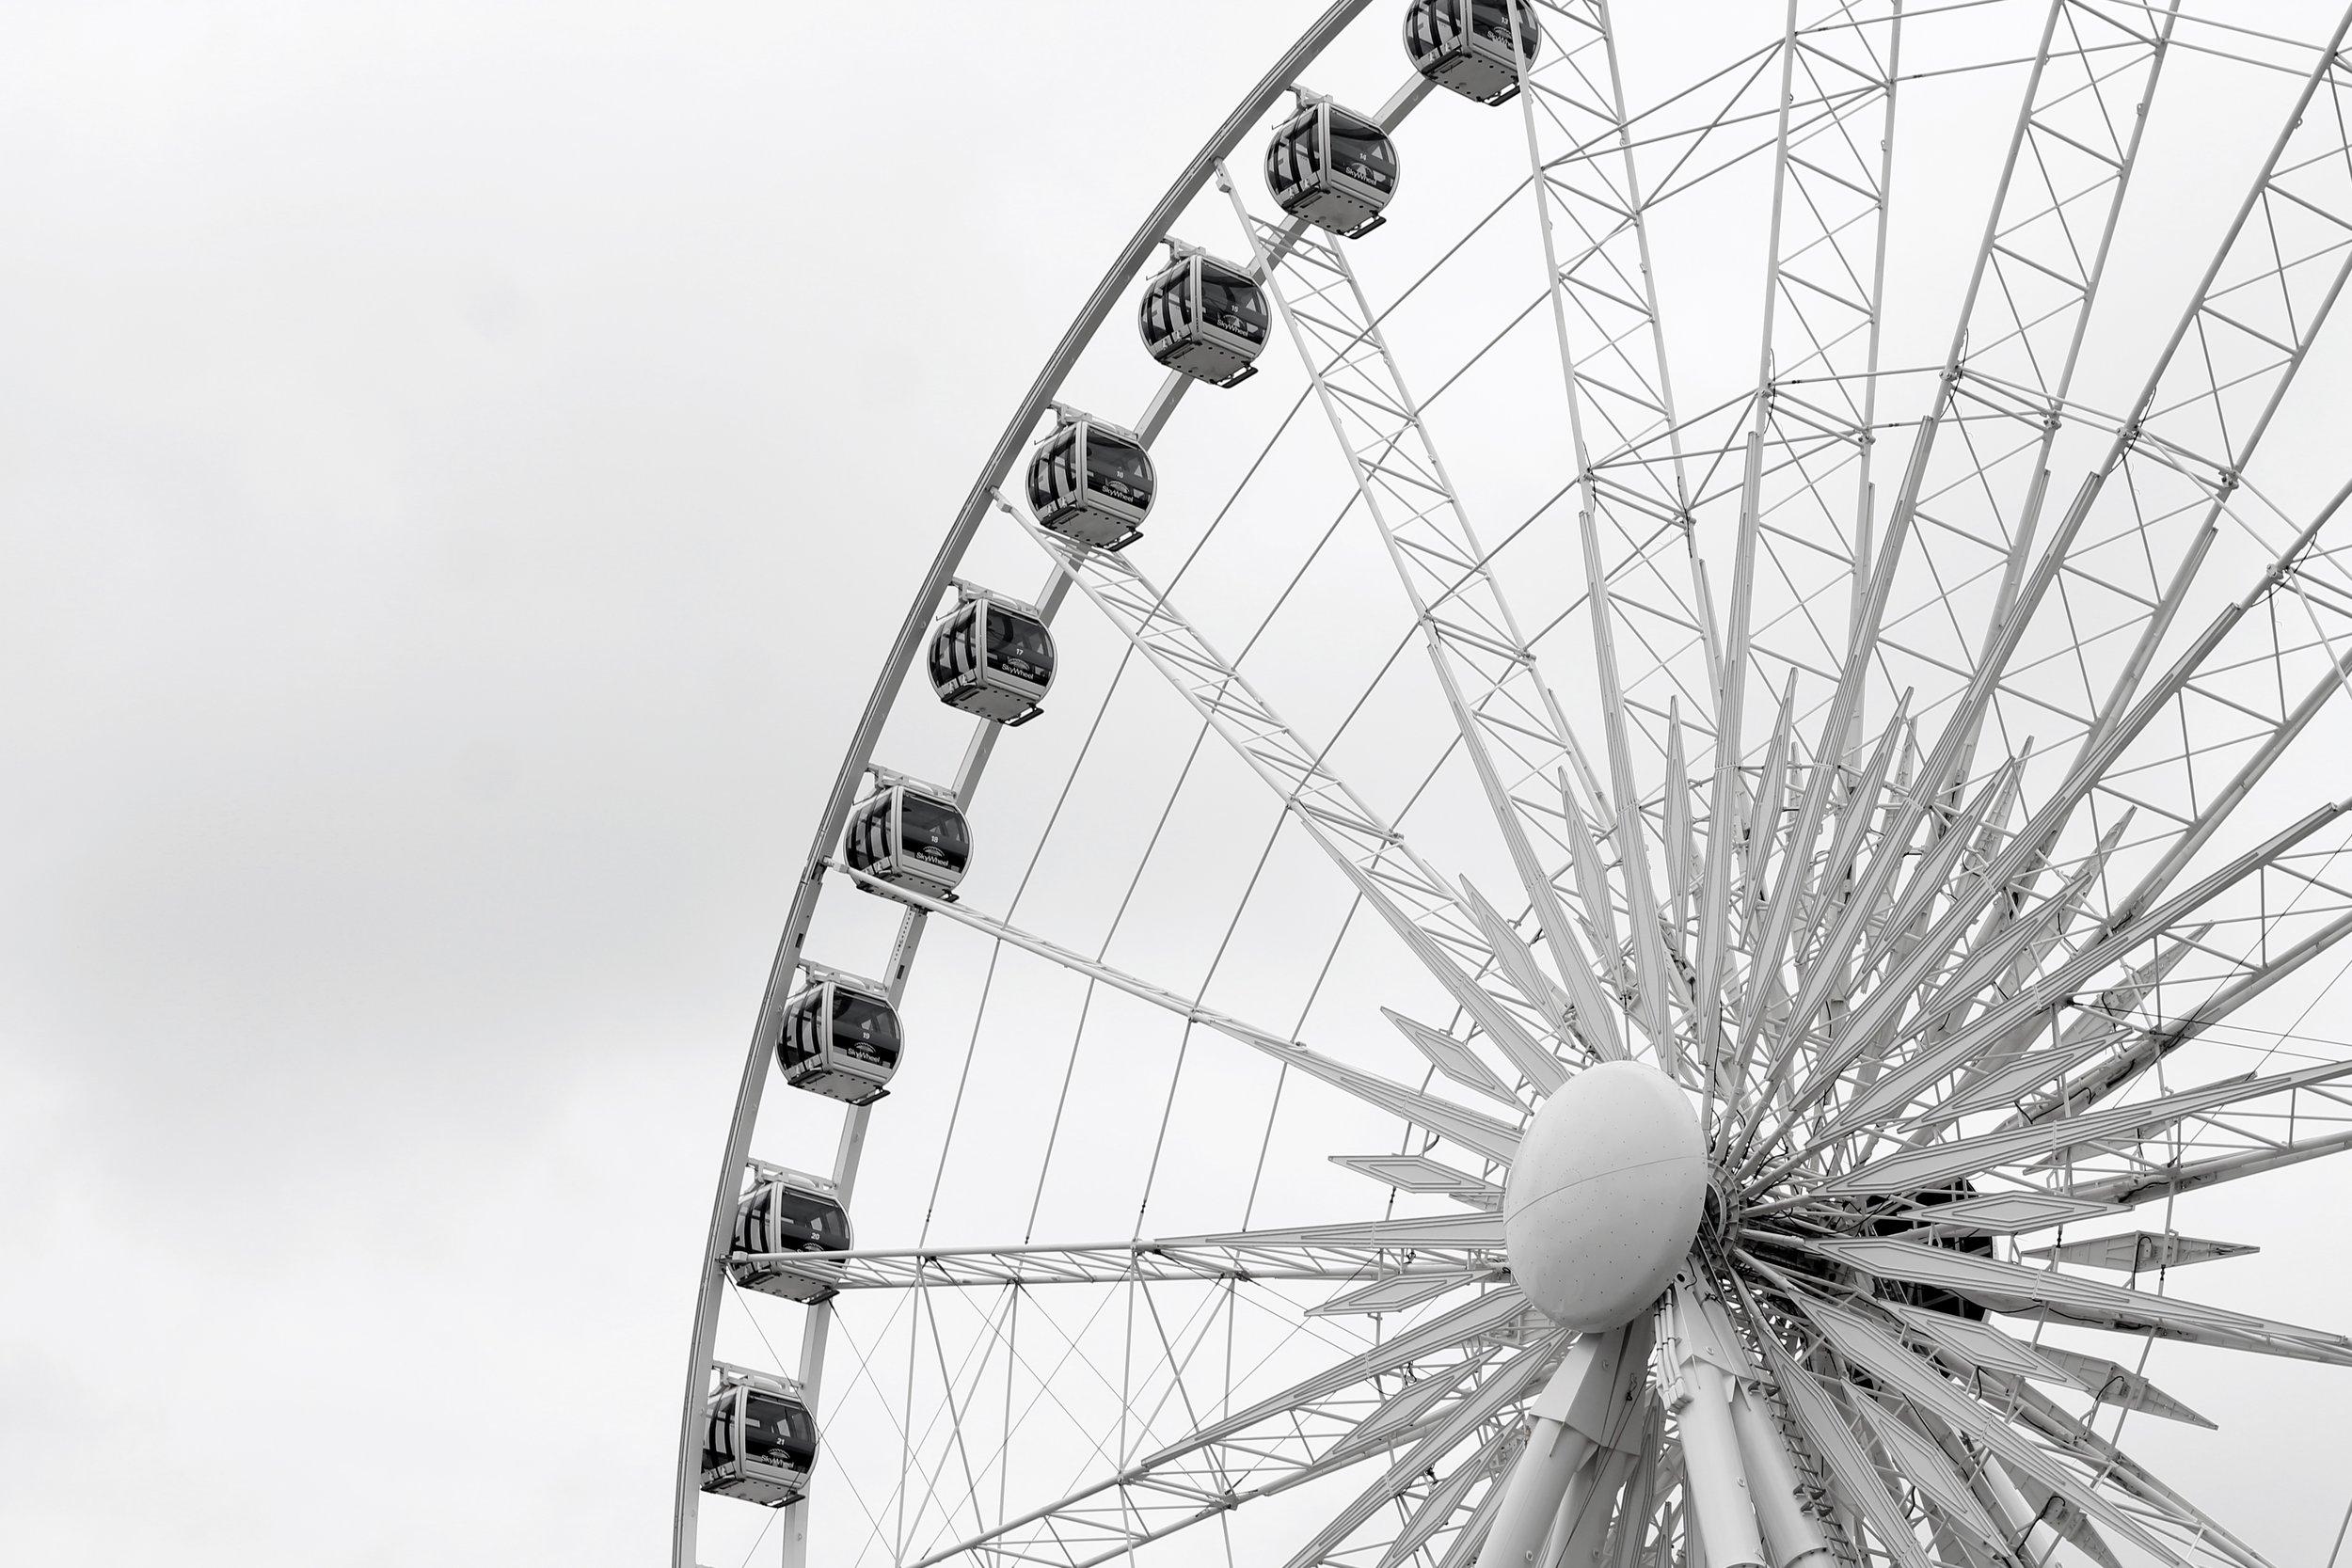 The Skyview Wheel in Clifton Hills in Niagara Falls, ON Canada taken by Bratty B